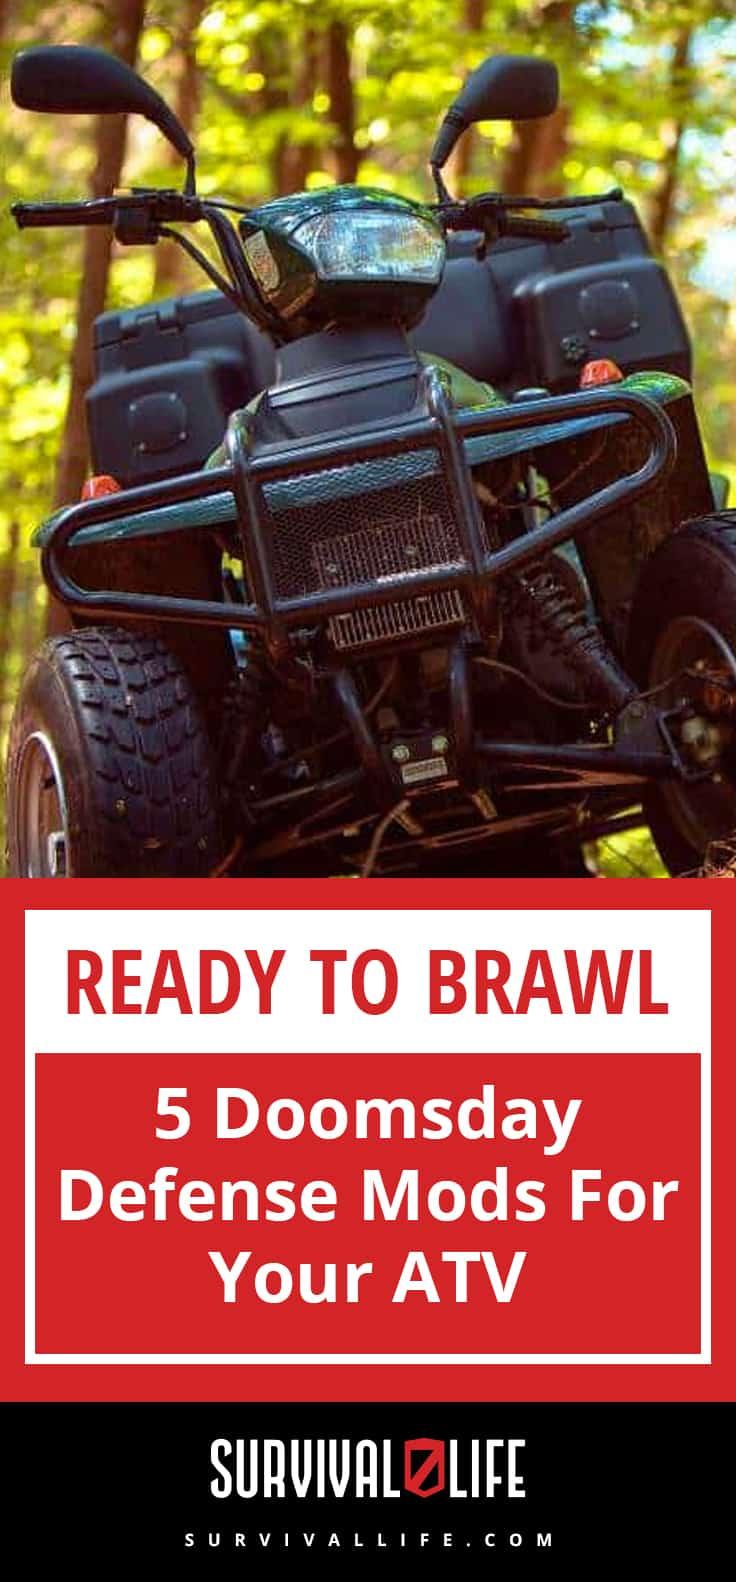 Ready To Brawl | 5 Doomsday Defense Mods For Your ATV